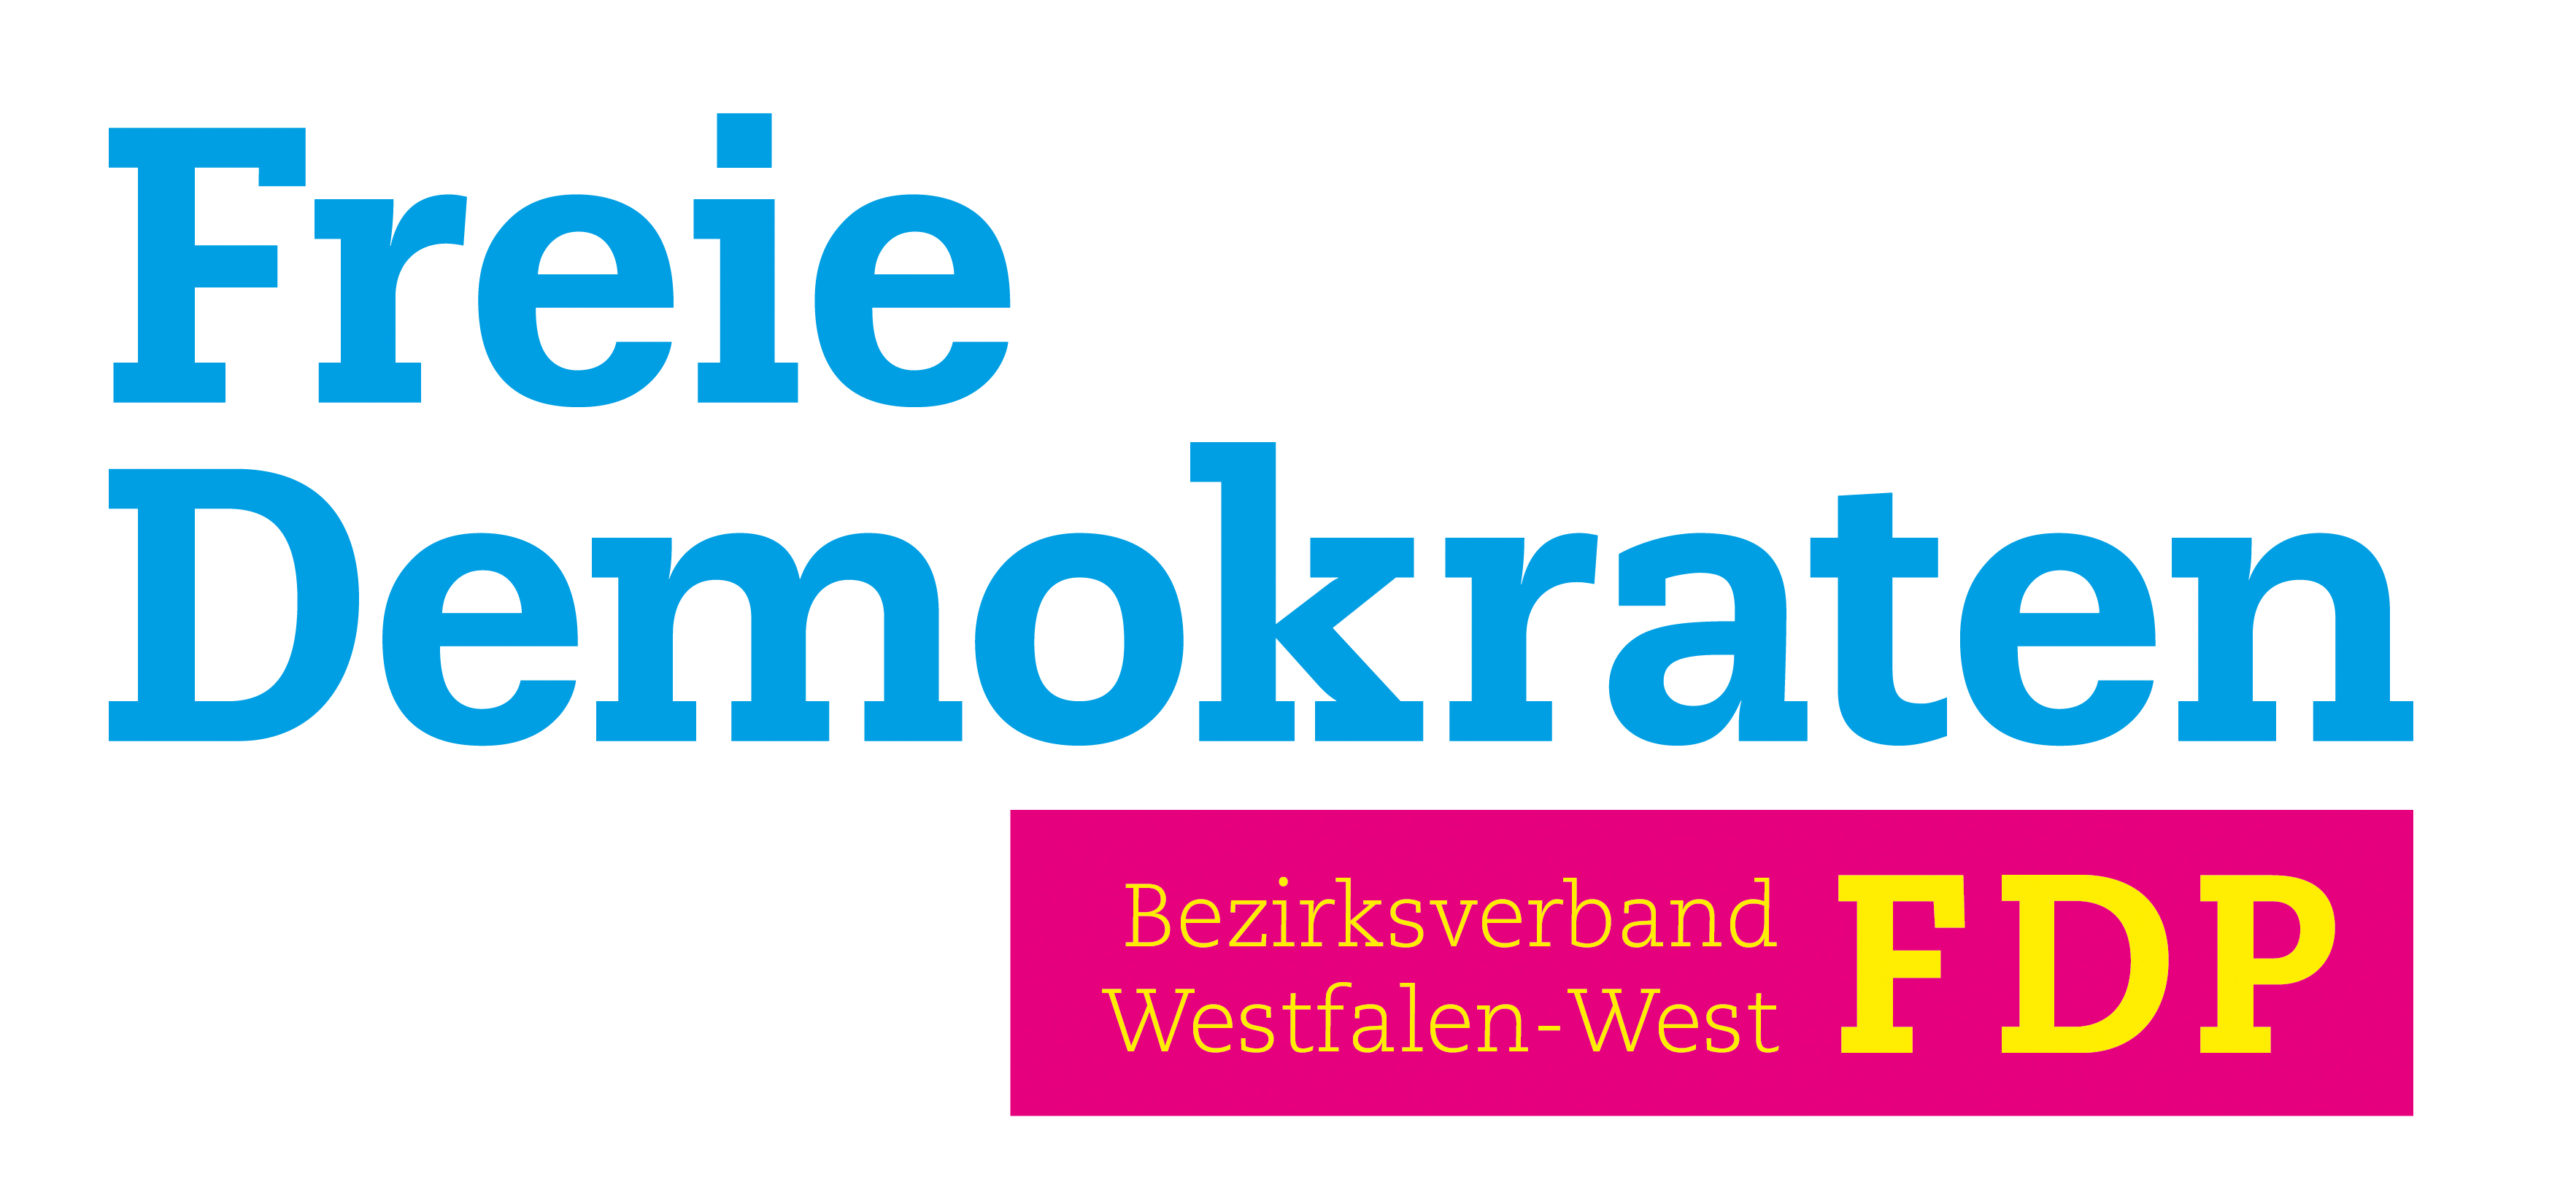 FDP Bezirksverband Westfalen-West